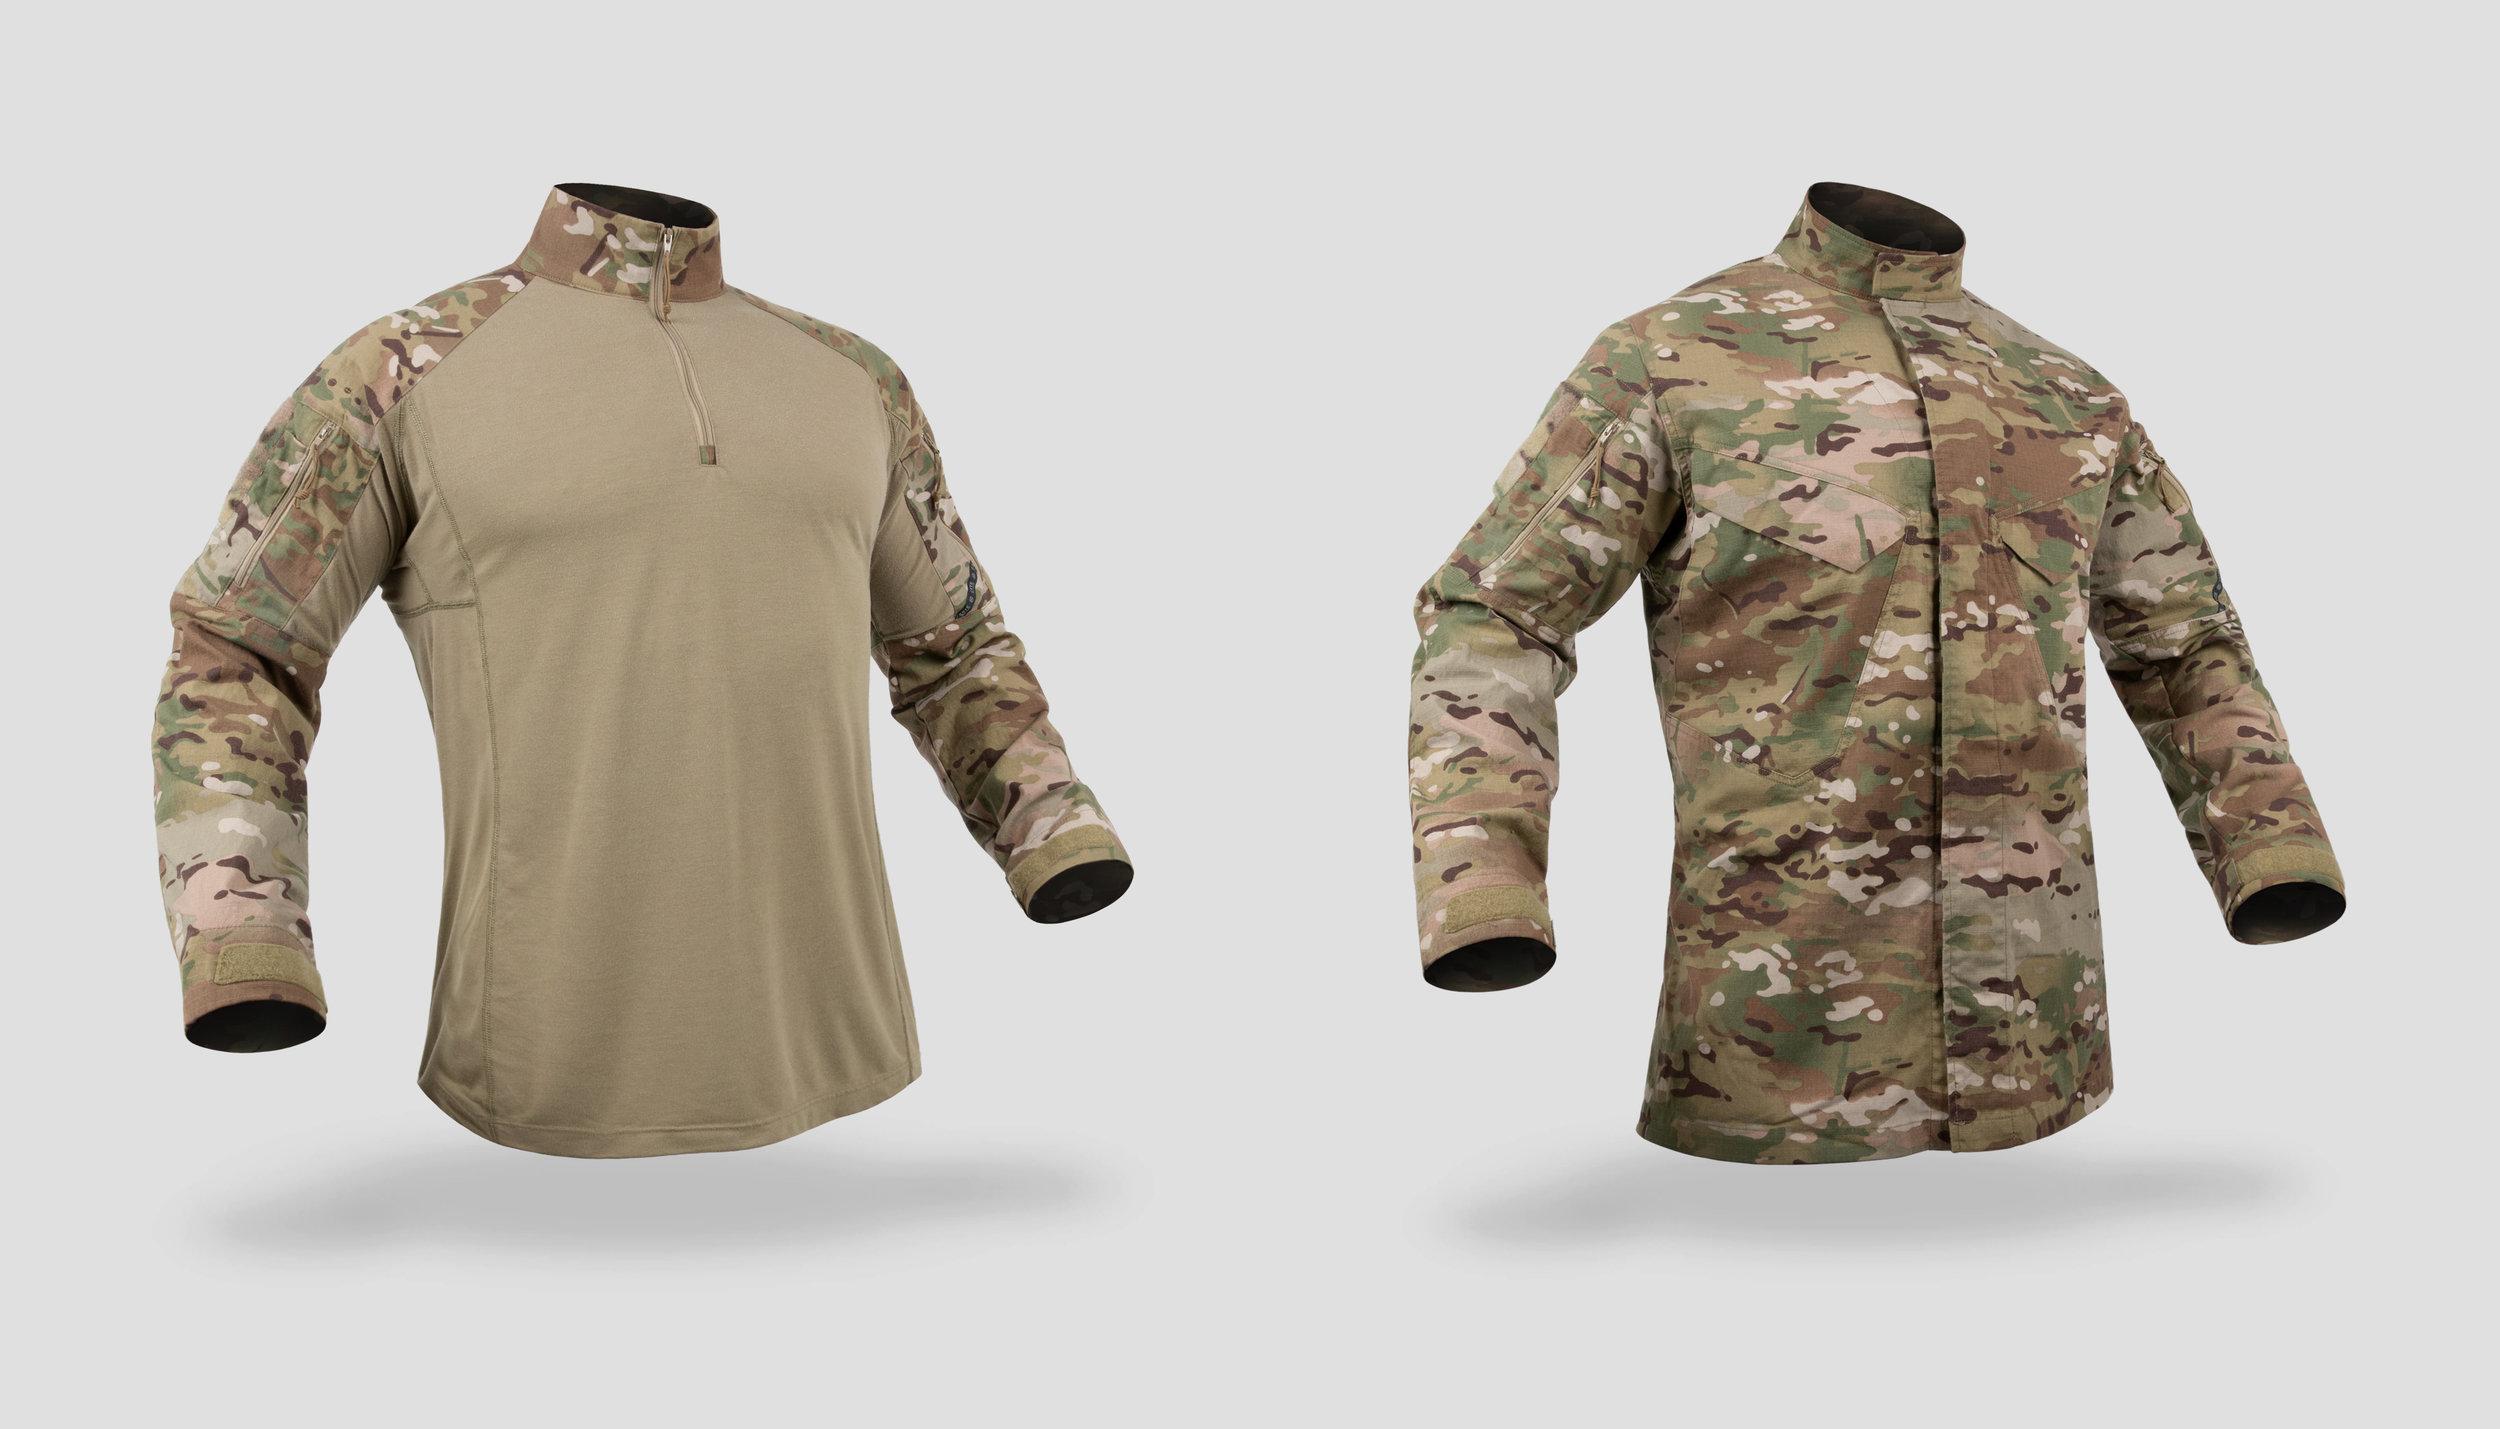 G4 Combat and Field Uniform